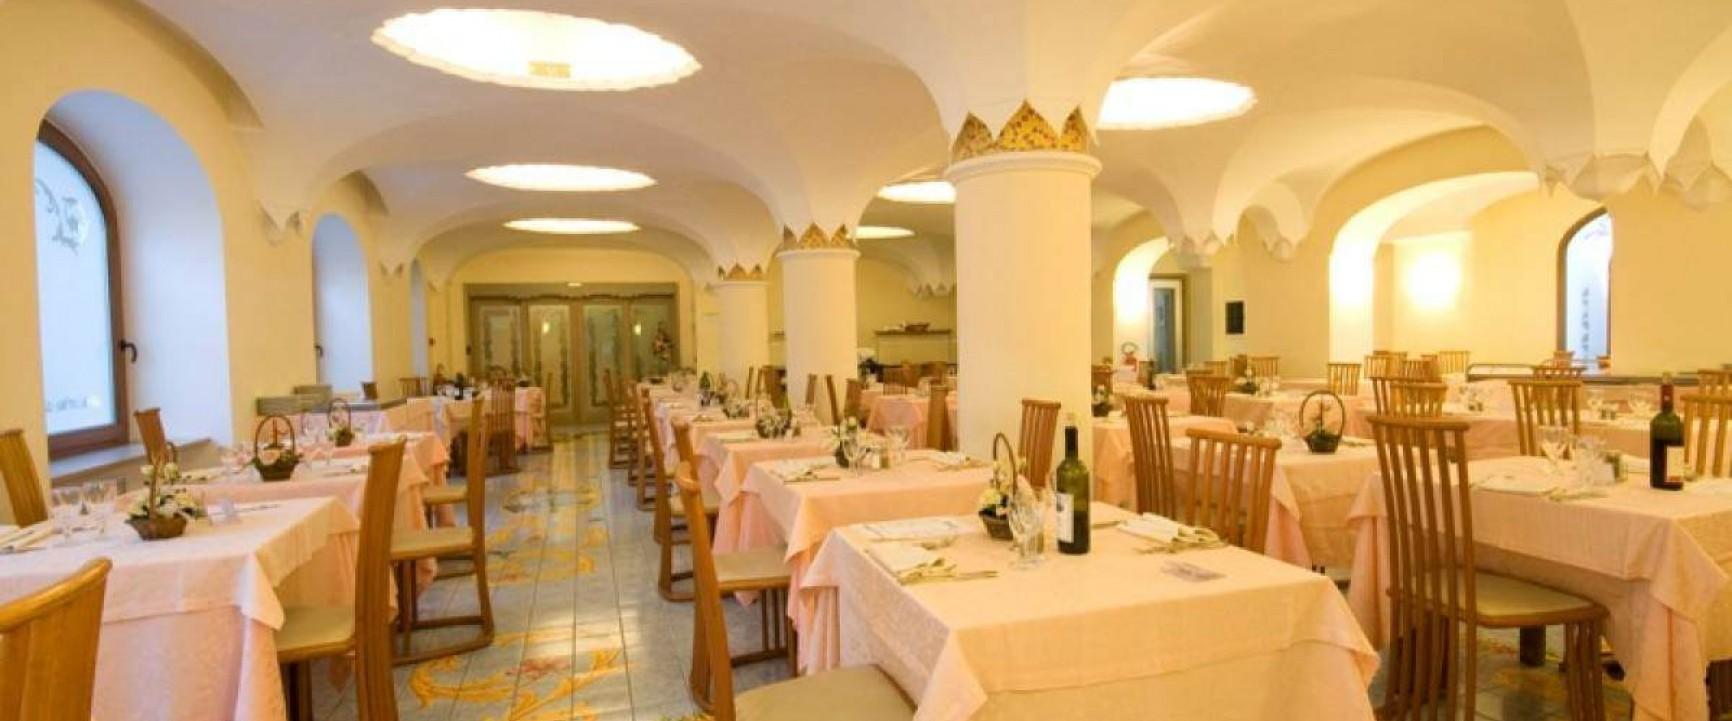 Hotel Terme Parco Verde